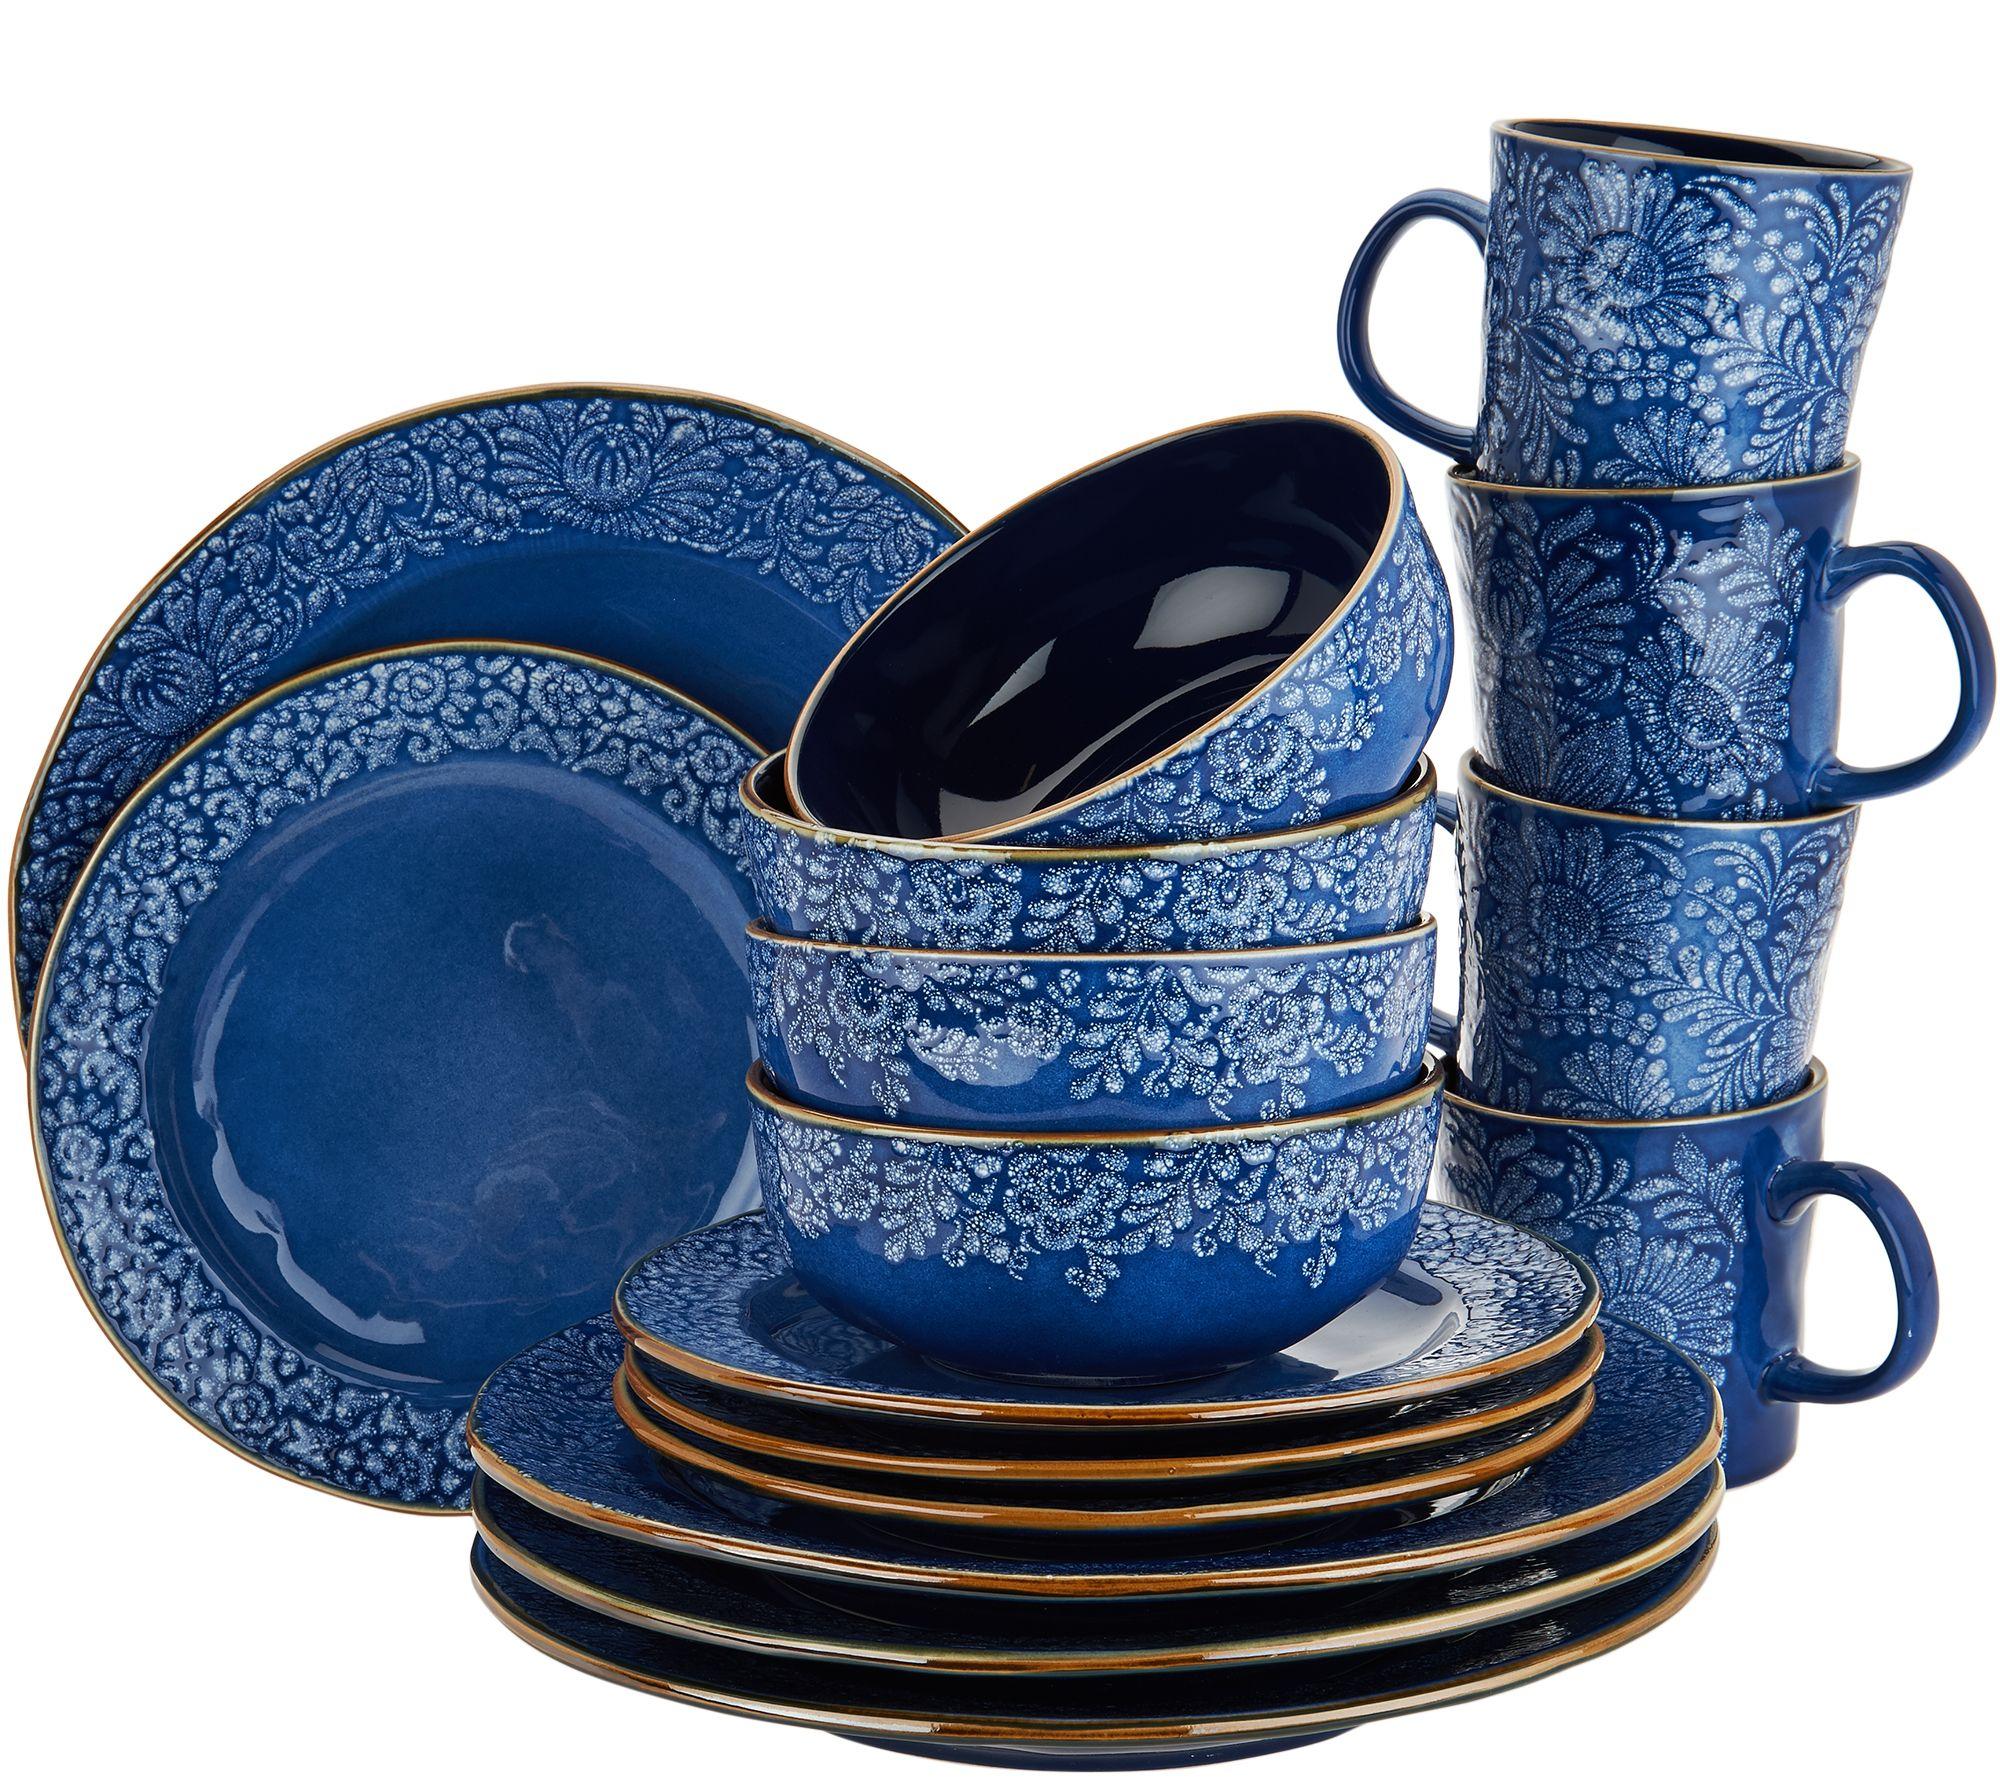 Cooku0027s Essentials Charlotte 16 Pc Ceramic Dinnerware Set   H211110